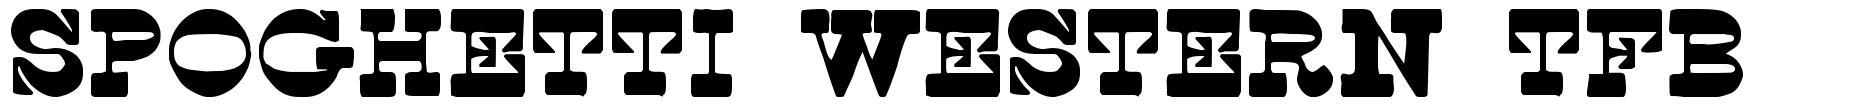 Spoghetti Western TFB font